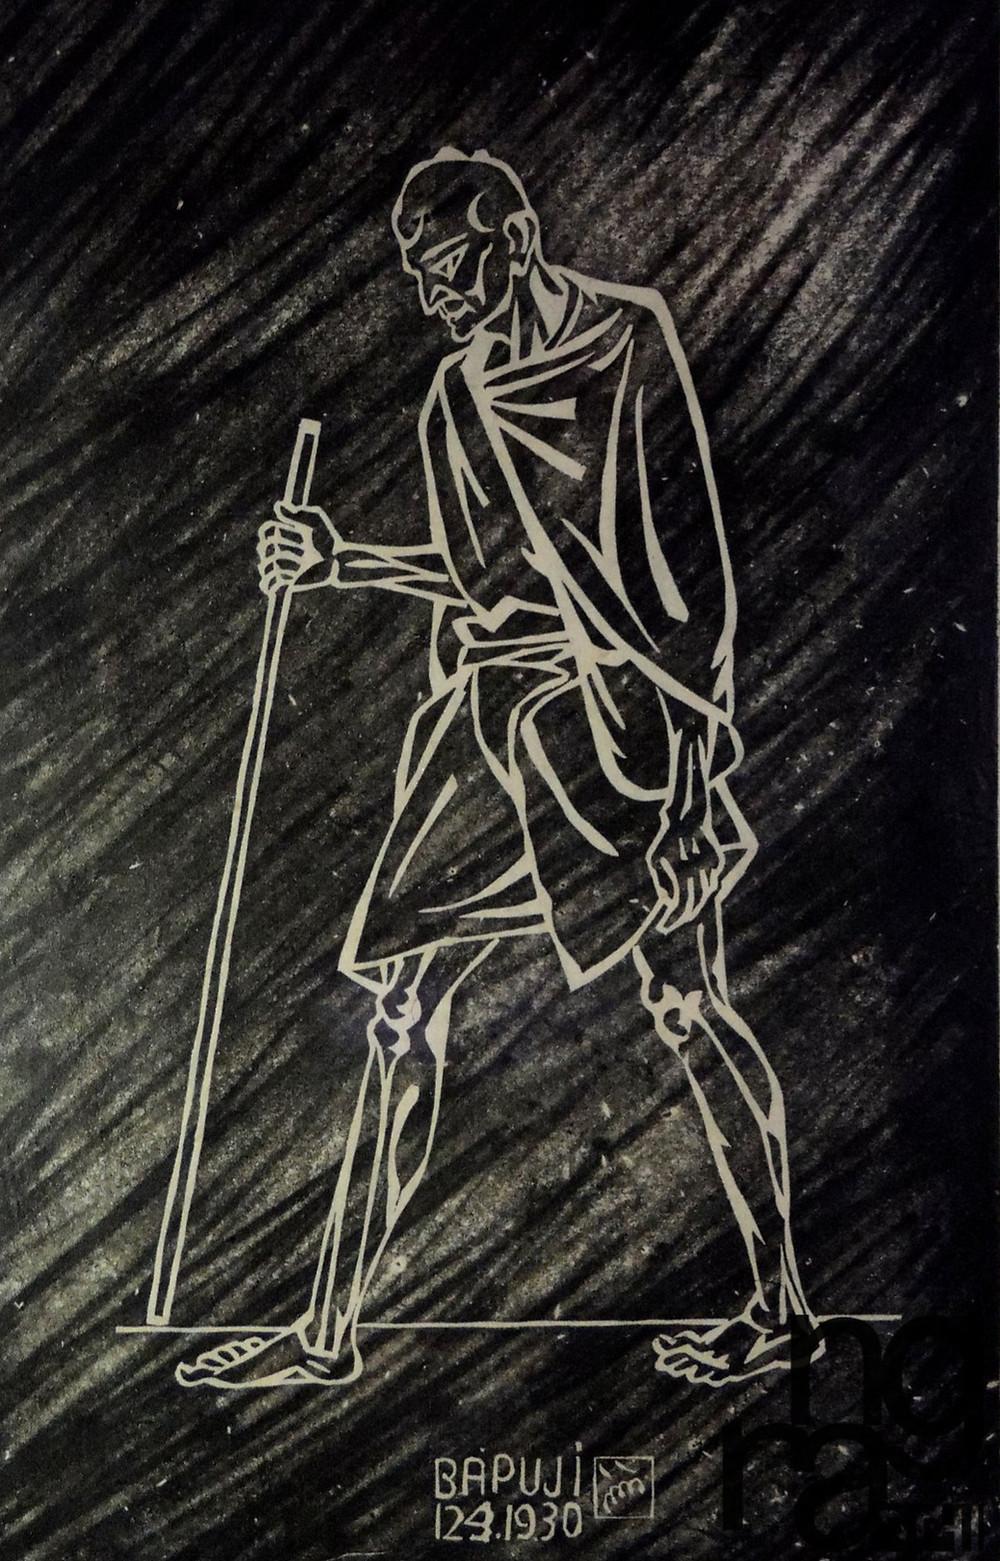 Nandalal Bose, 'Bapuji', 1930